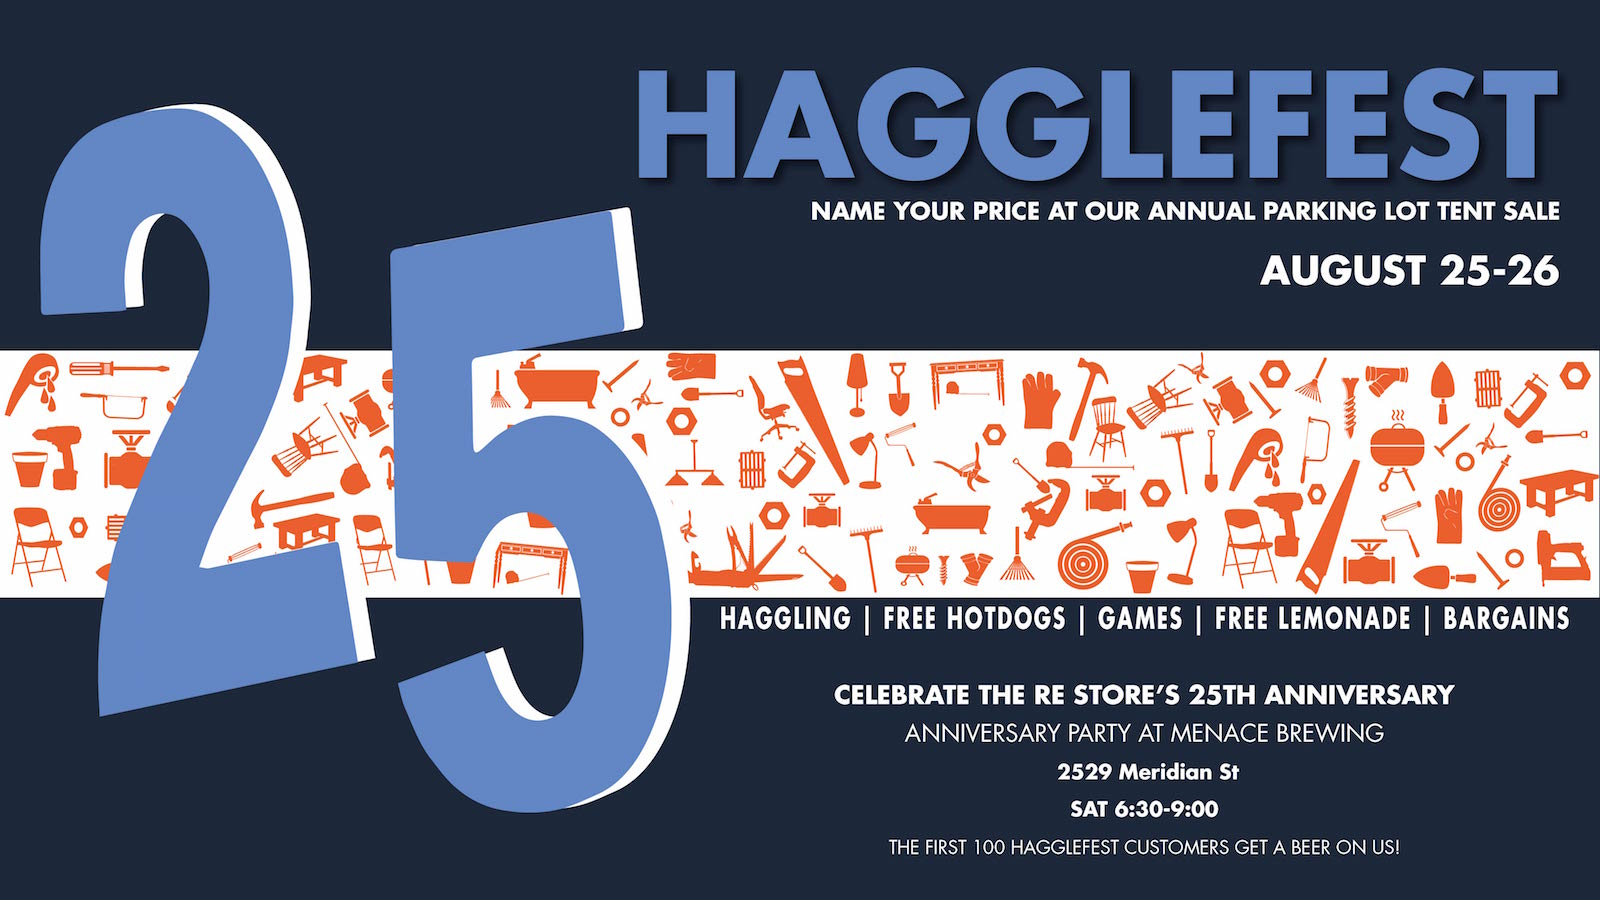 2018 Hagglefest annual tent sale